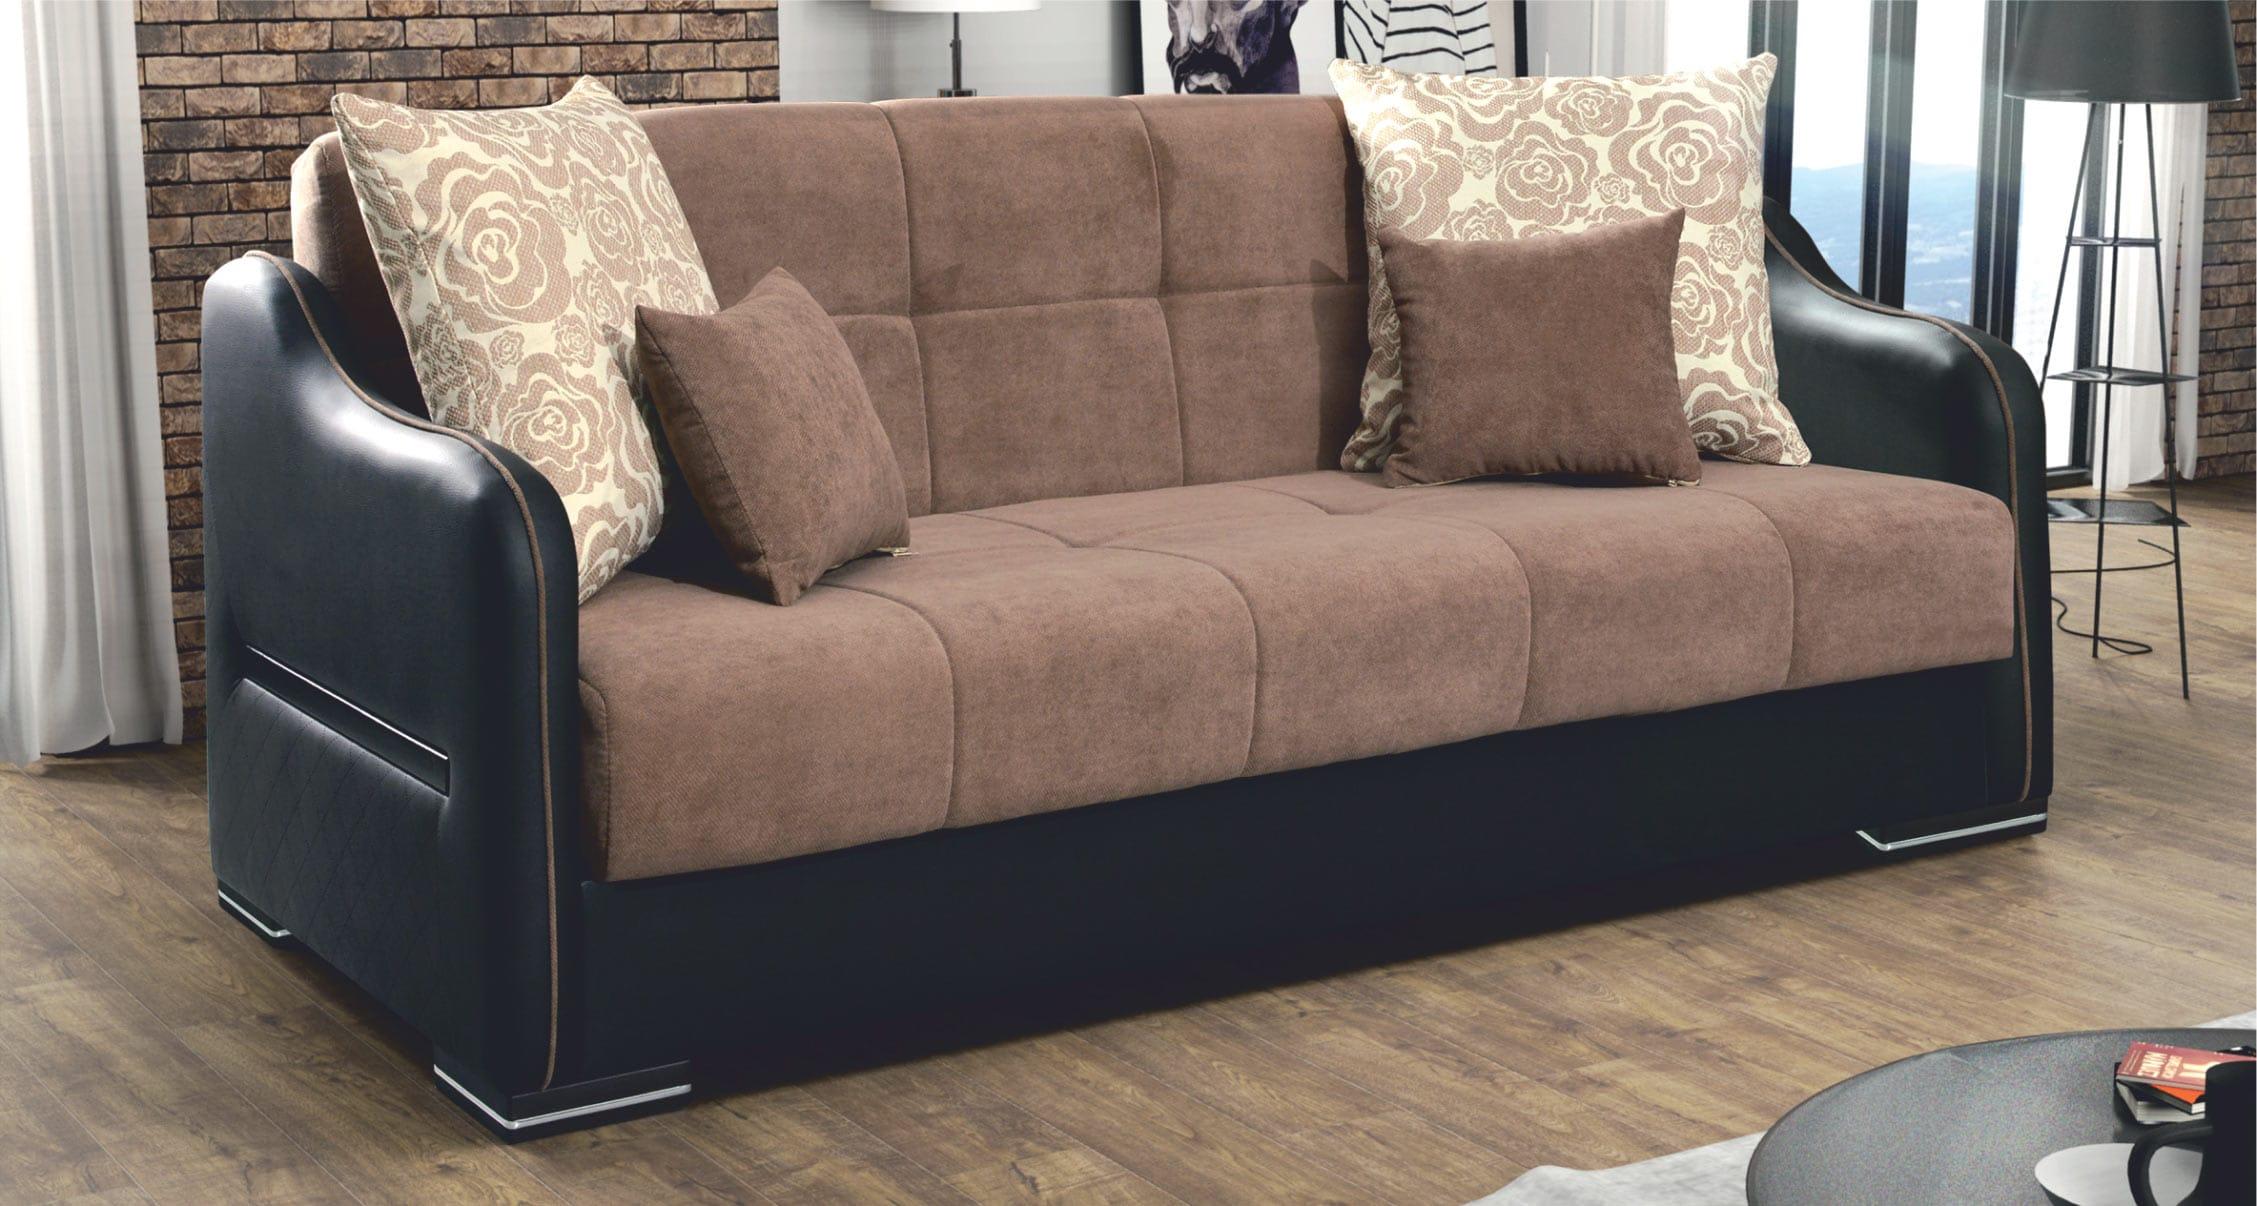 Daisy Brown Sofa Sleeper by Skyler Designs